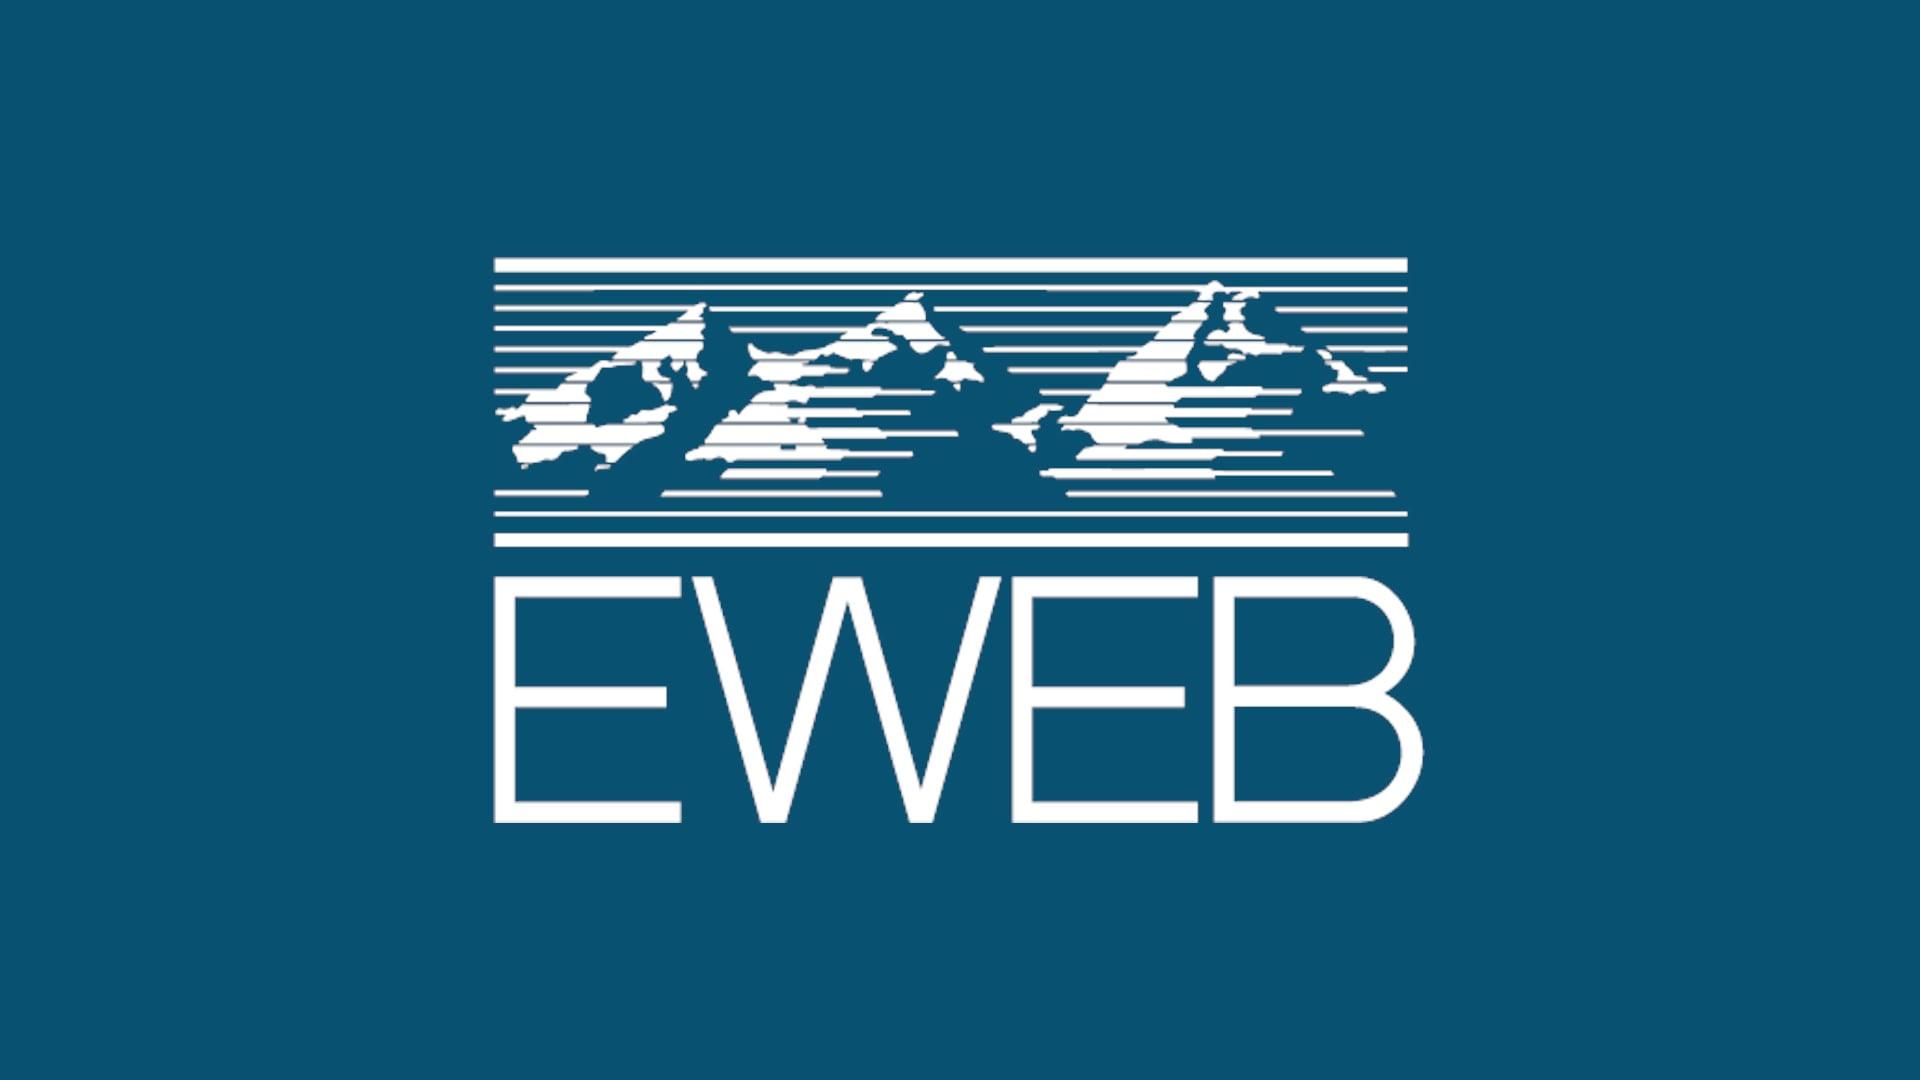 Eweb Customer Care